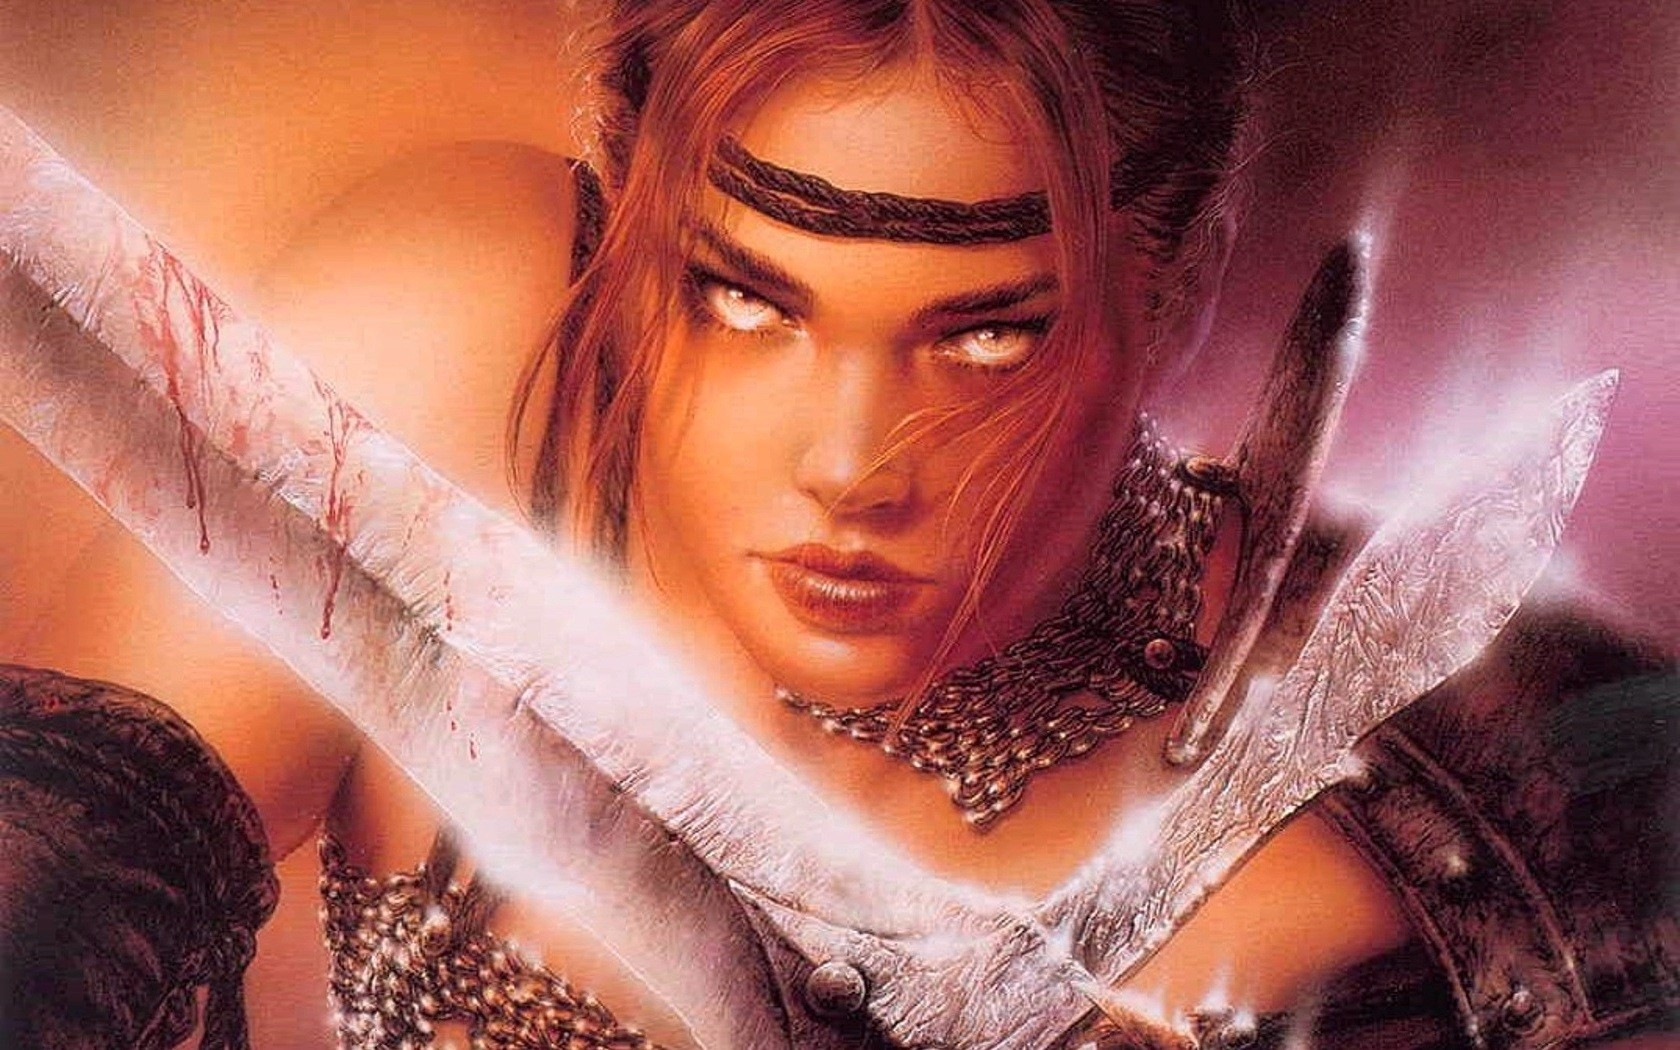 General 1680x1050 Luis Royo women sword fantasy girl